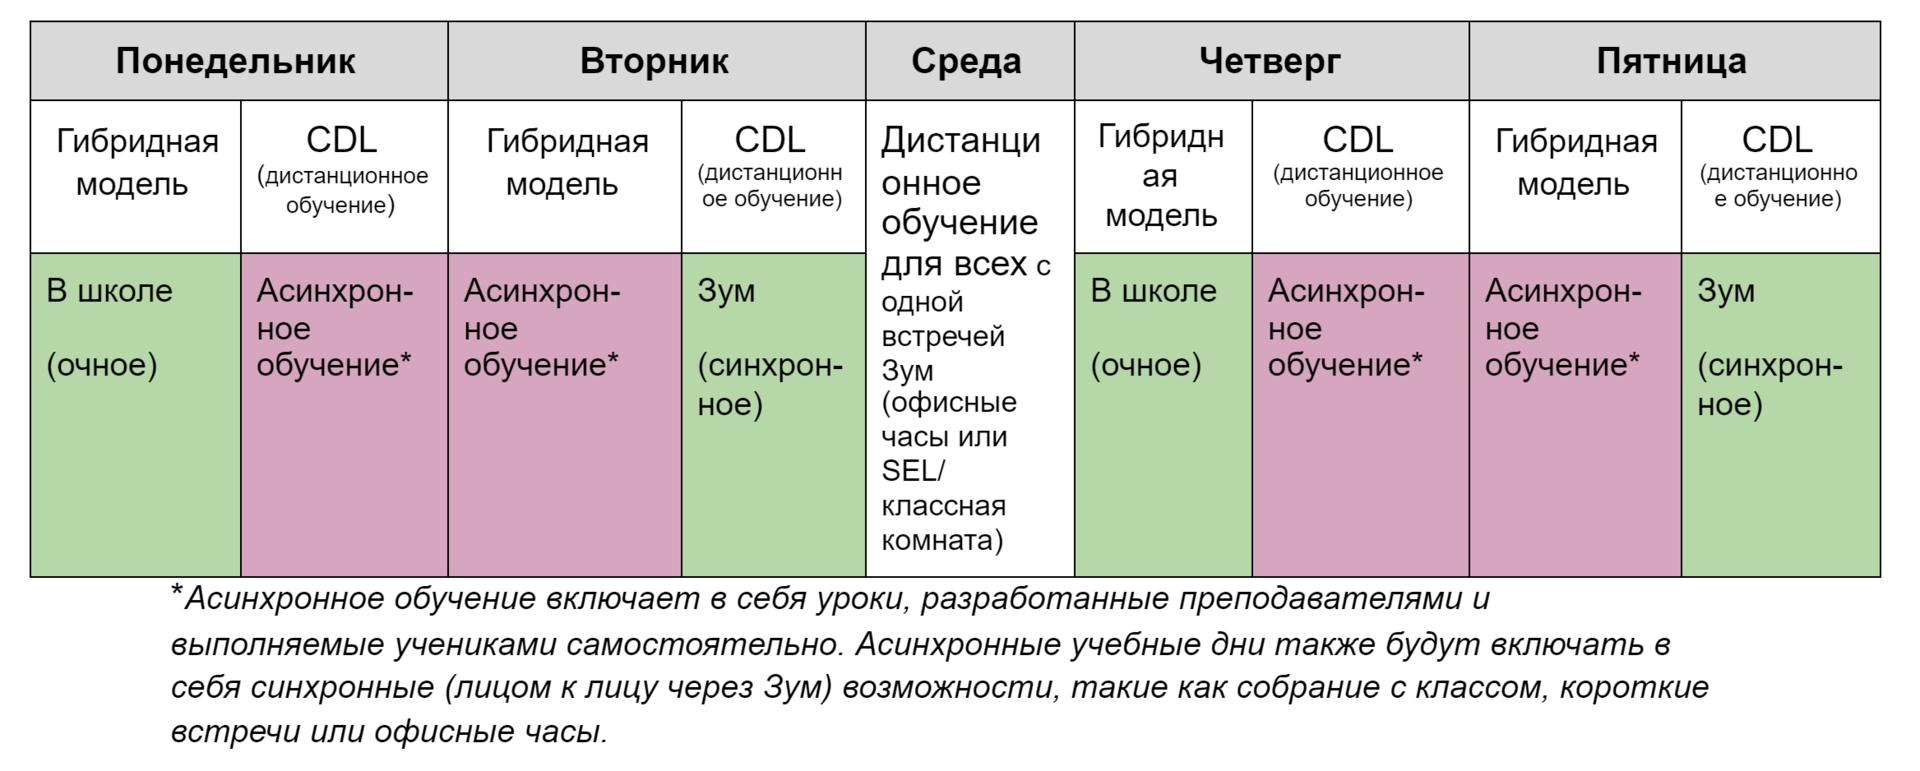 Hybrid schedule - Russian